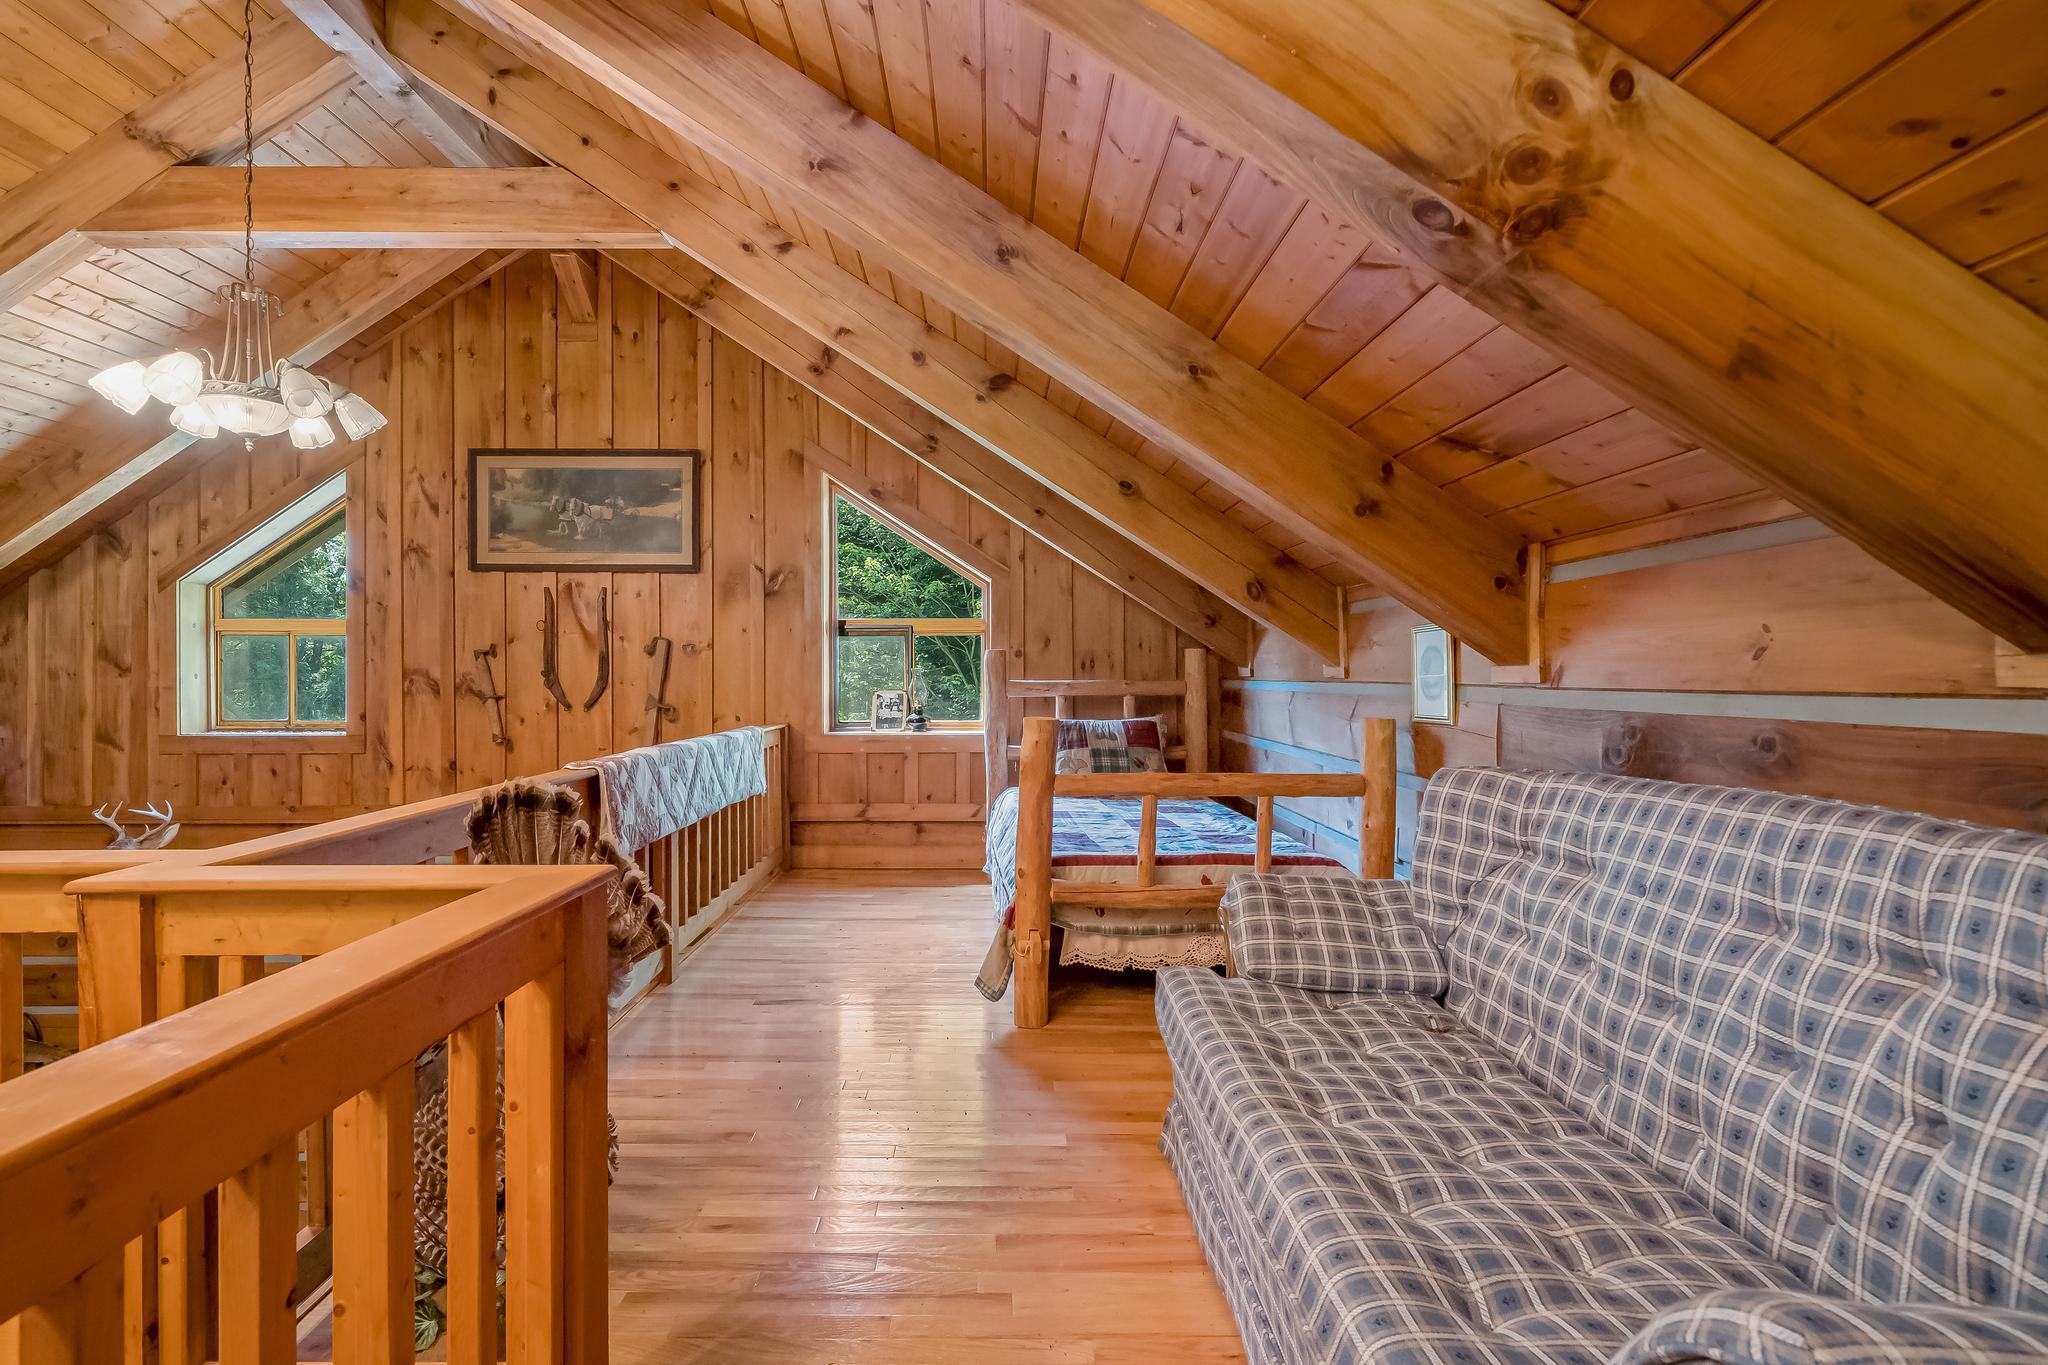 780 Bill Icenhour Lane Lodge Attached (1